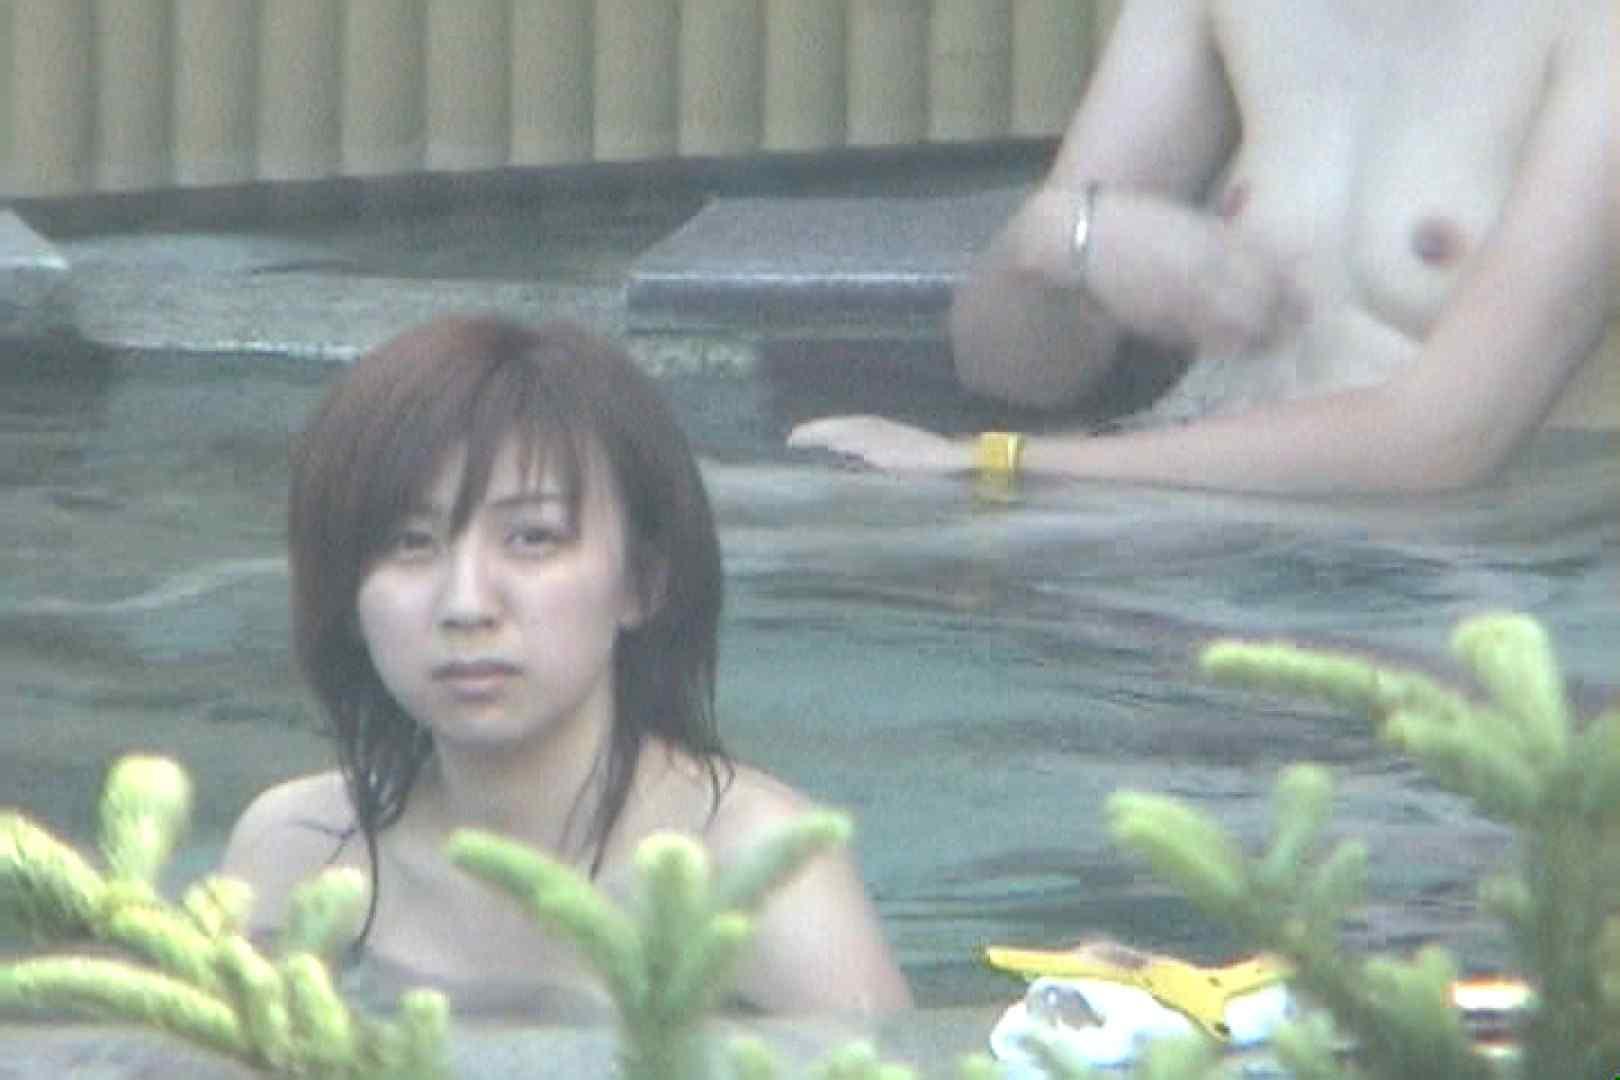 Aquaな露天風呂Vol.77【VIP限定】 露天   盗撮特集  98画像 90